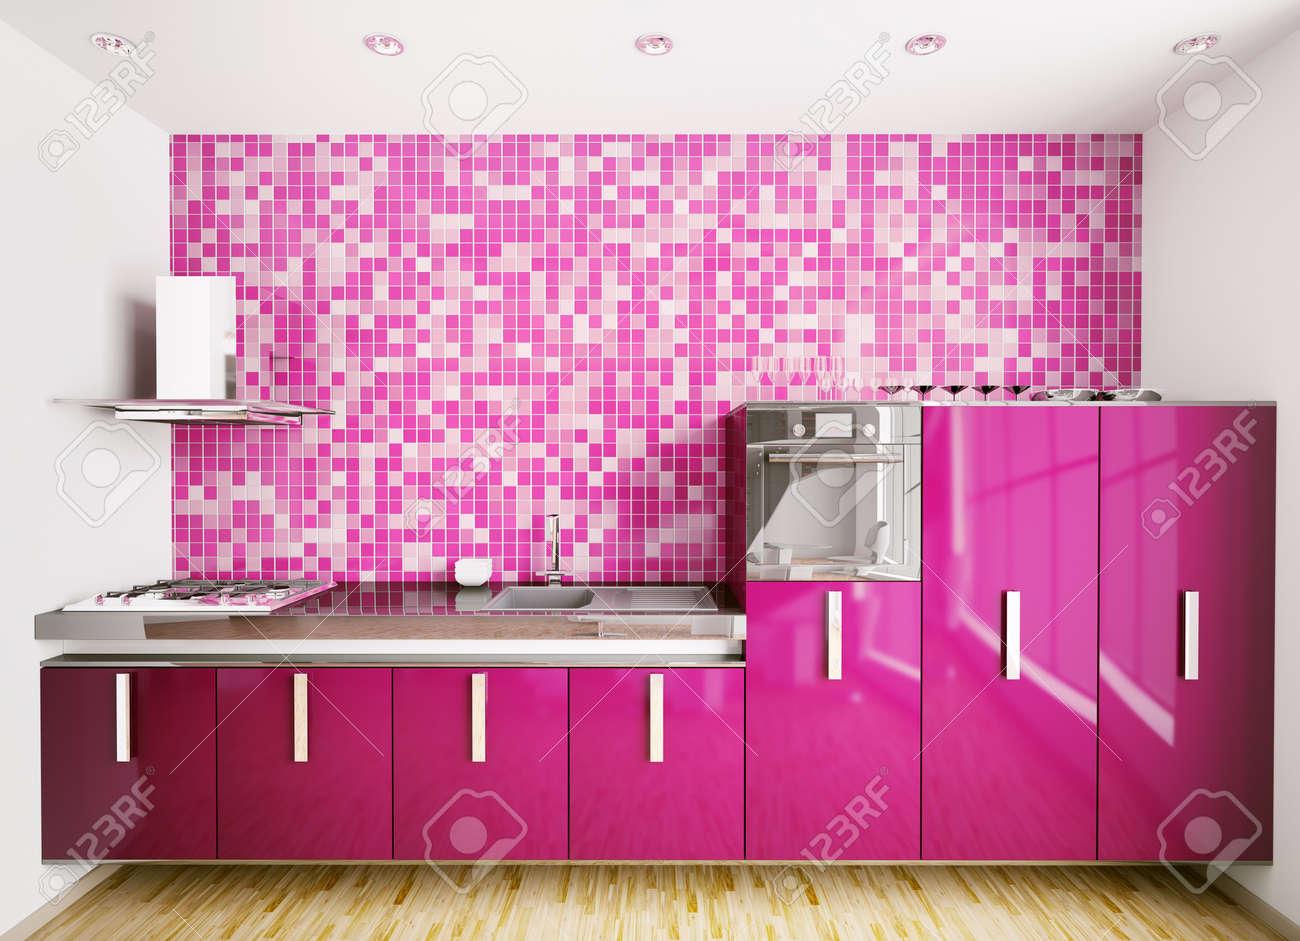 interior of modern purple kitchen over mosaic wall 3d render stock